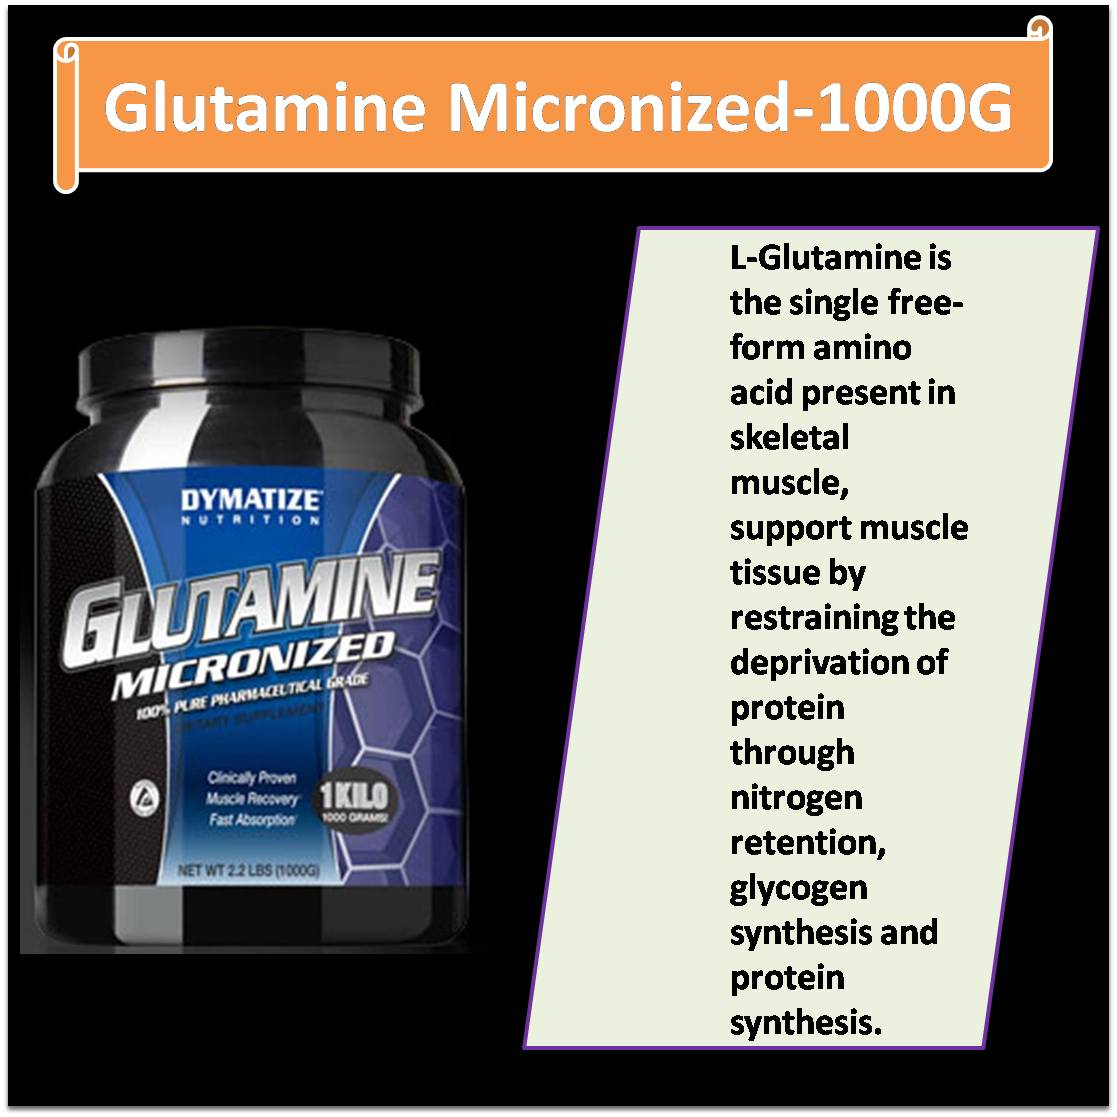 Glutamine Micronized-1000G